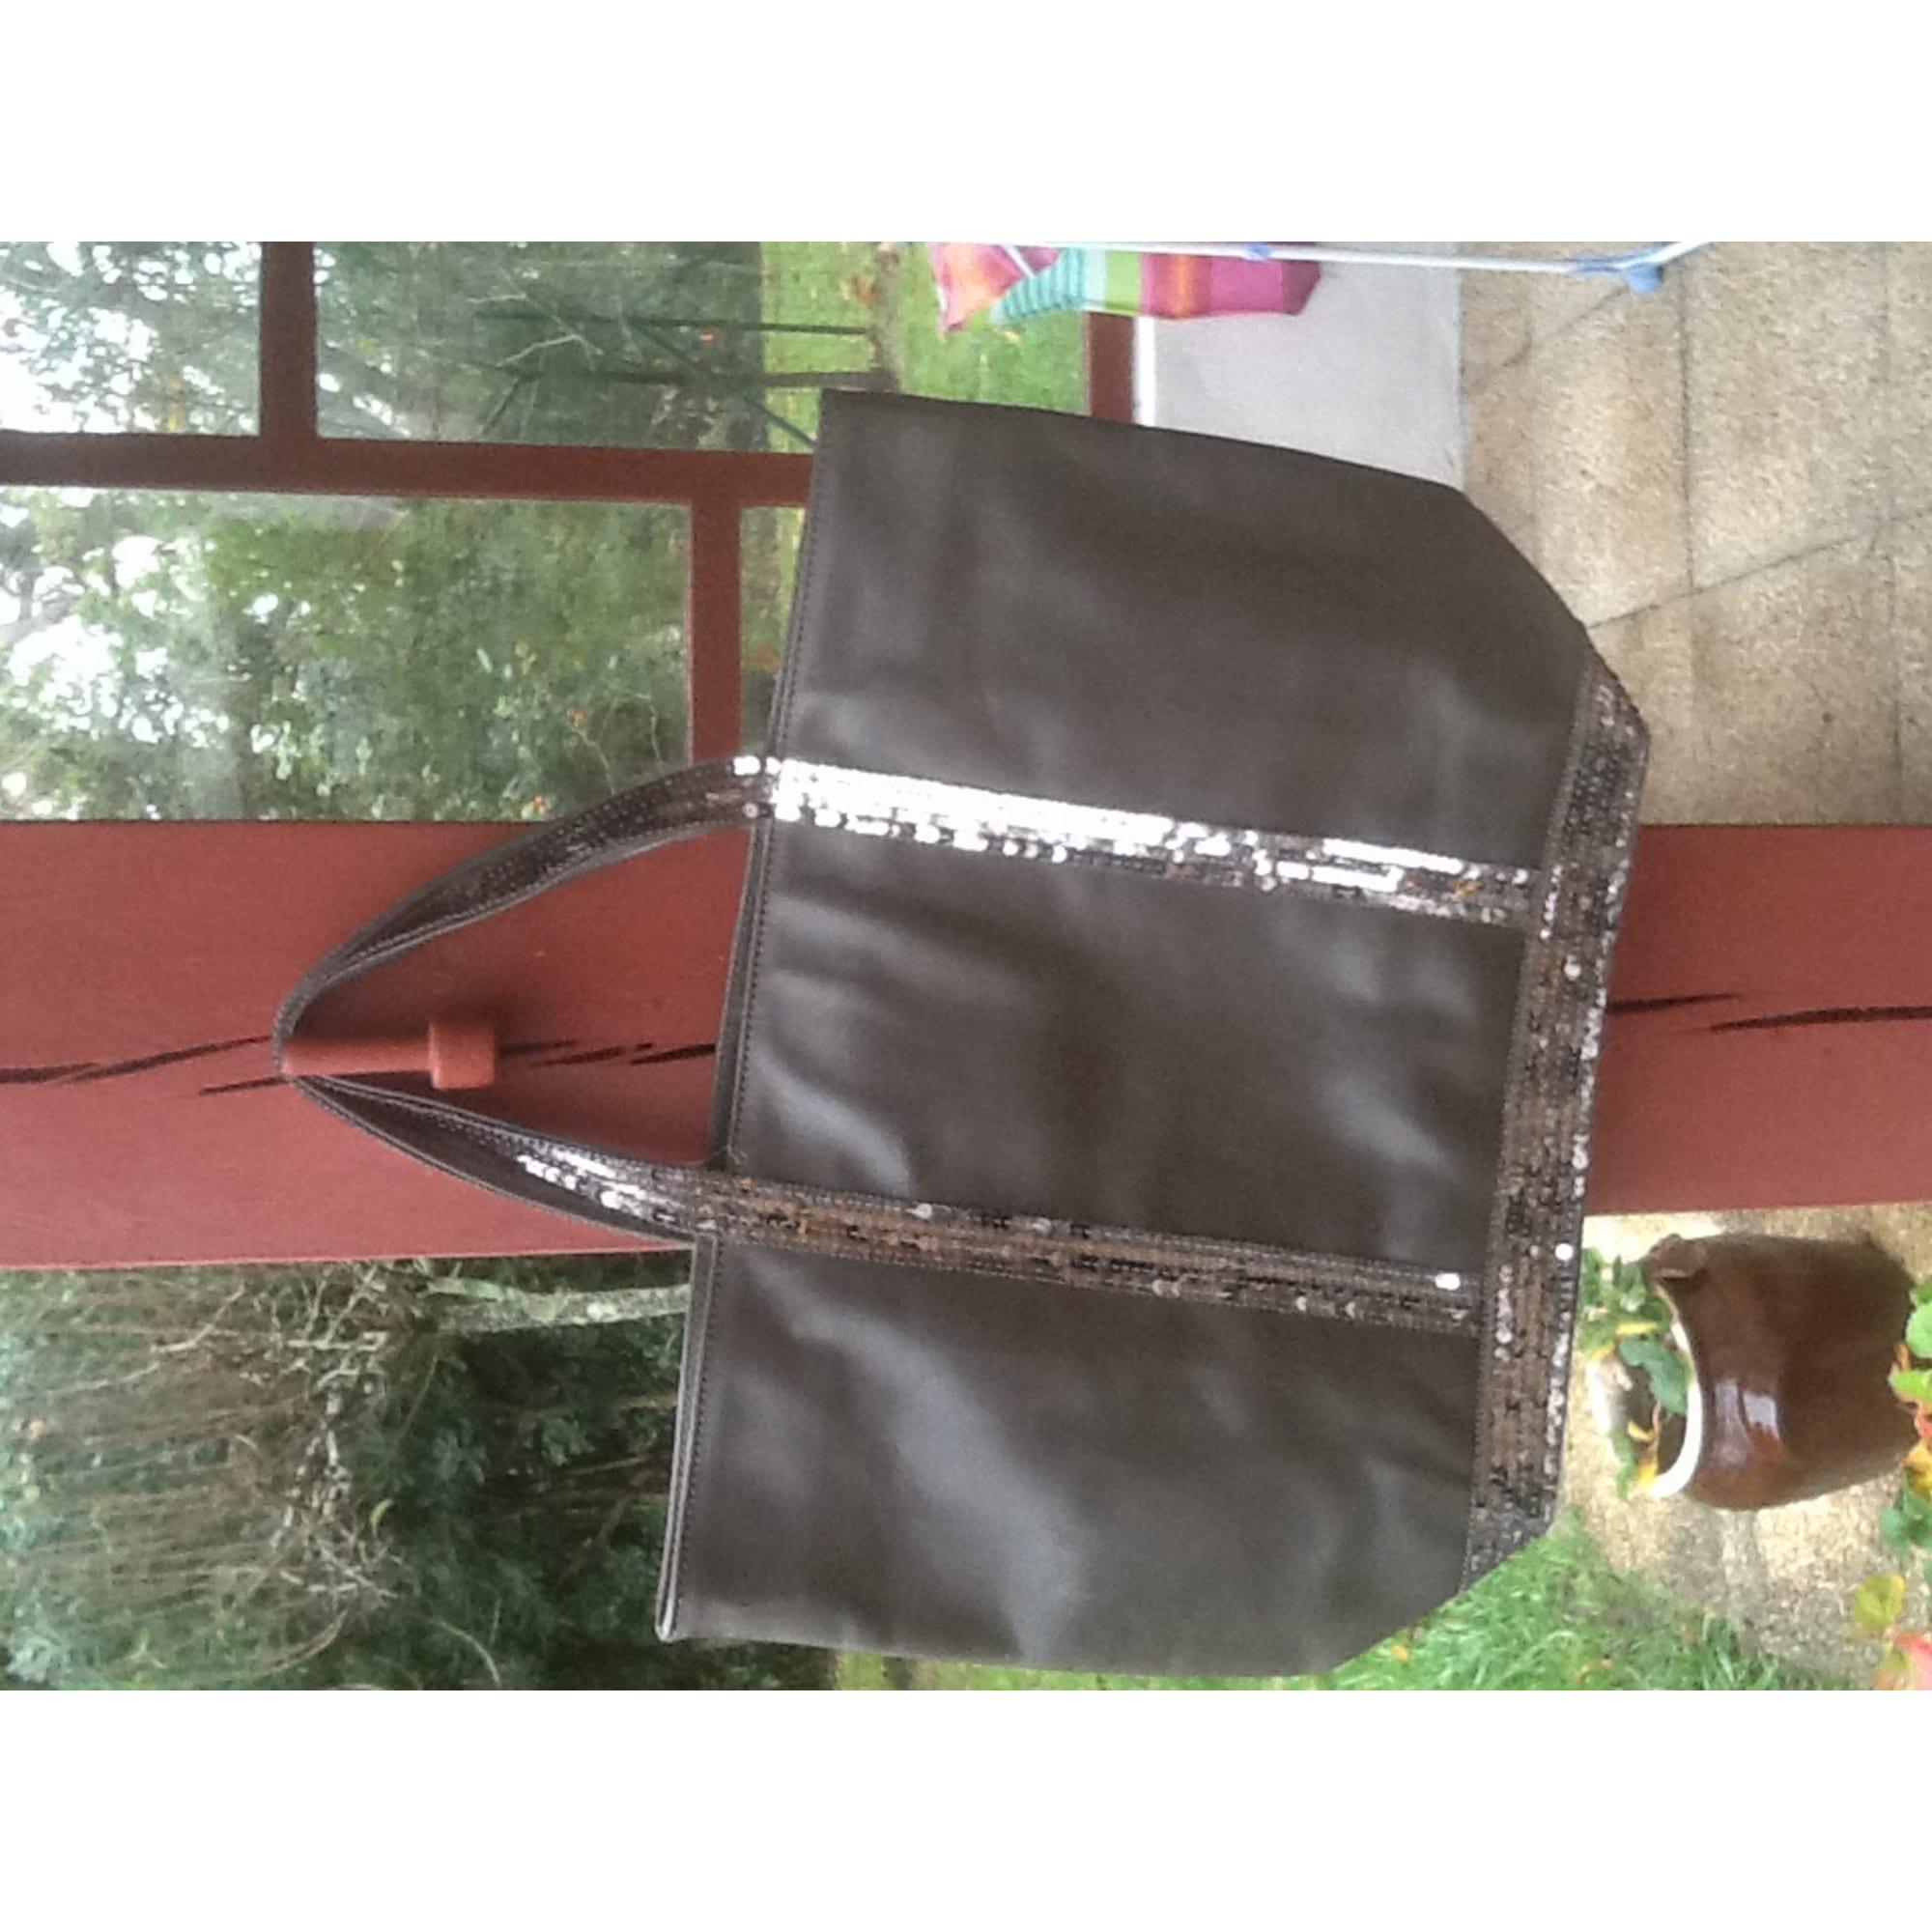 c221283b7f Sac à main en cuir VANESSA BRUNO gris vendu par Carole 57264438 ...